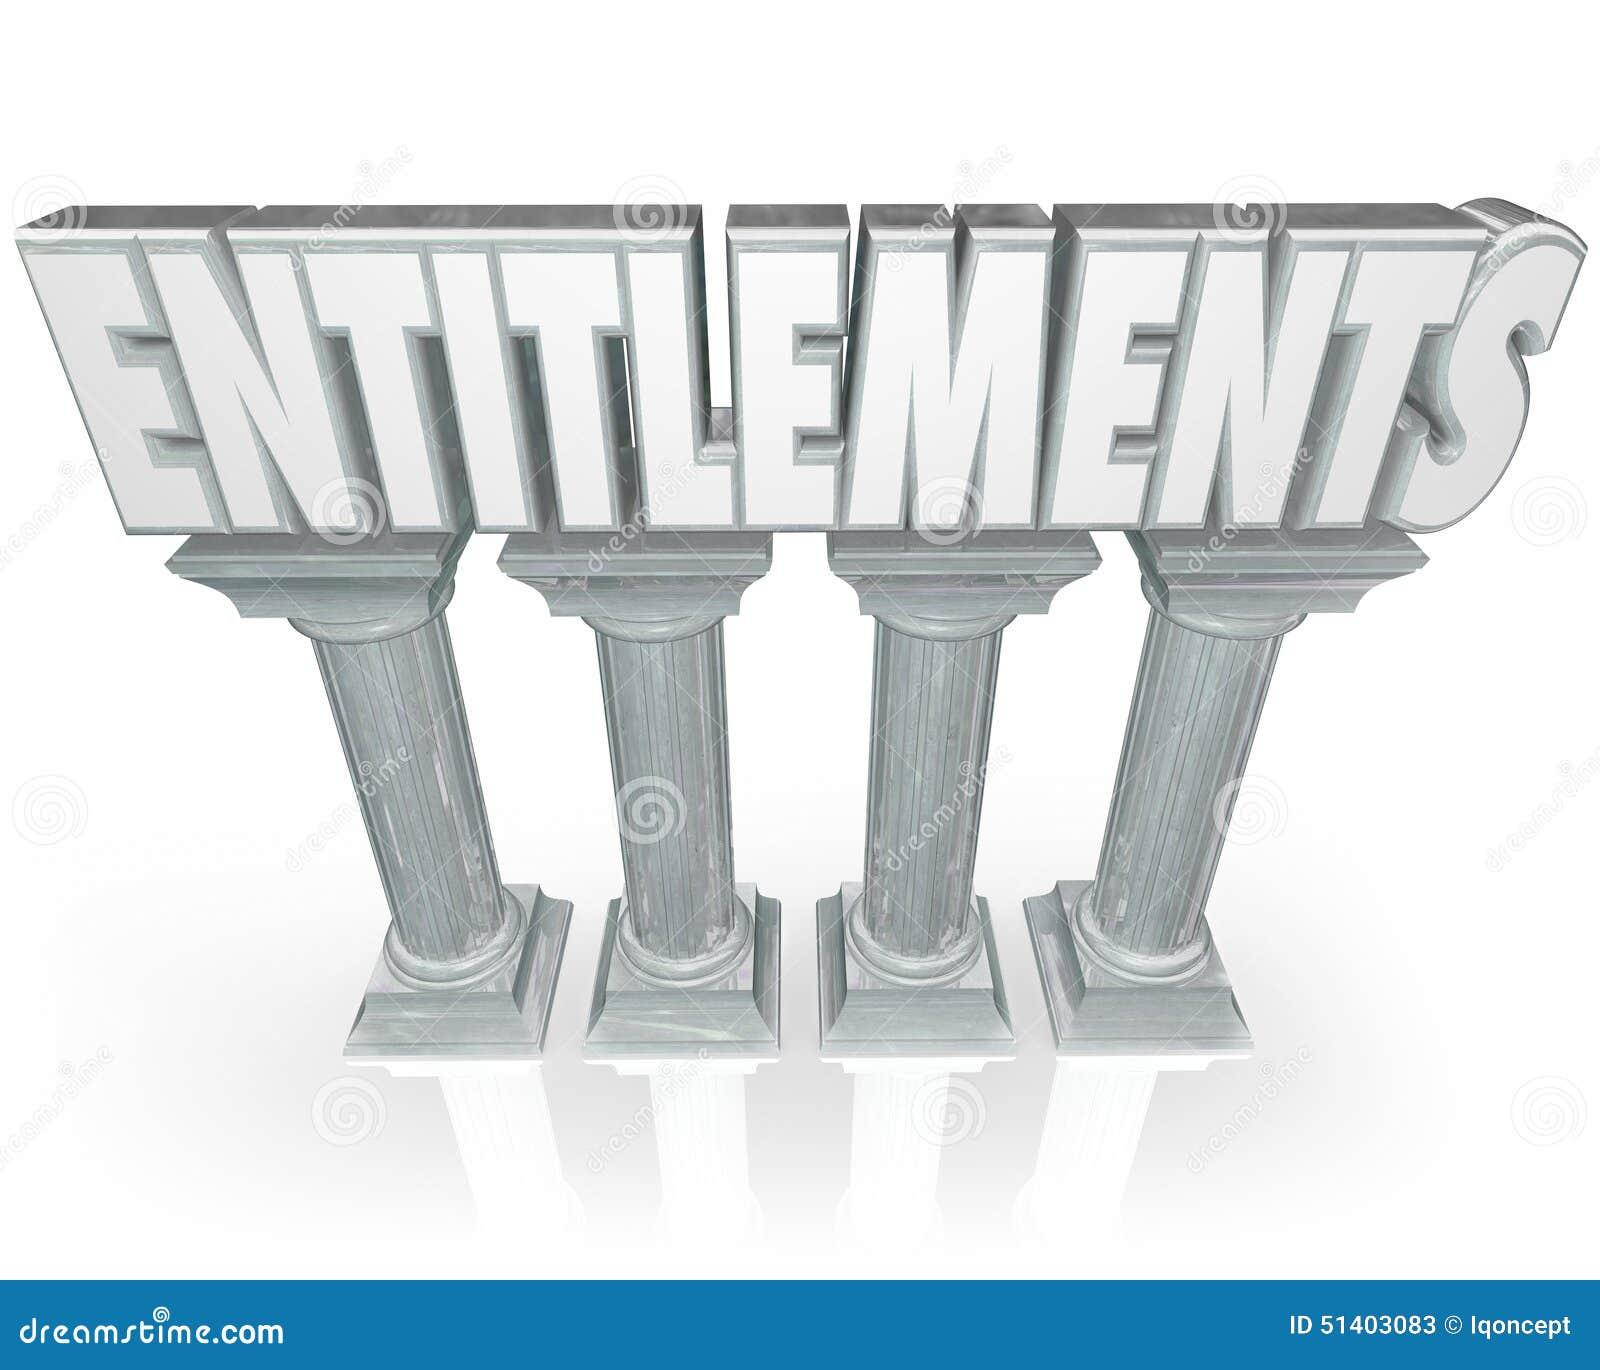 Holiday Entilement: Entitlements Stone Columns Government Benefits Handouts